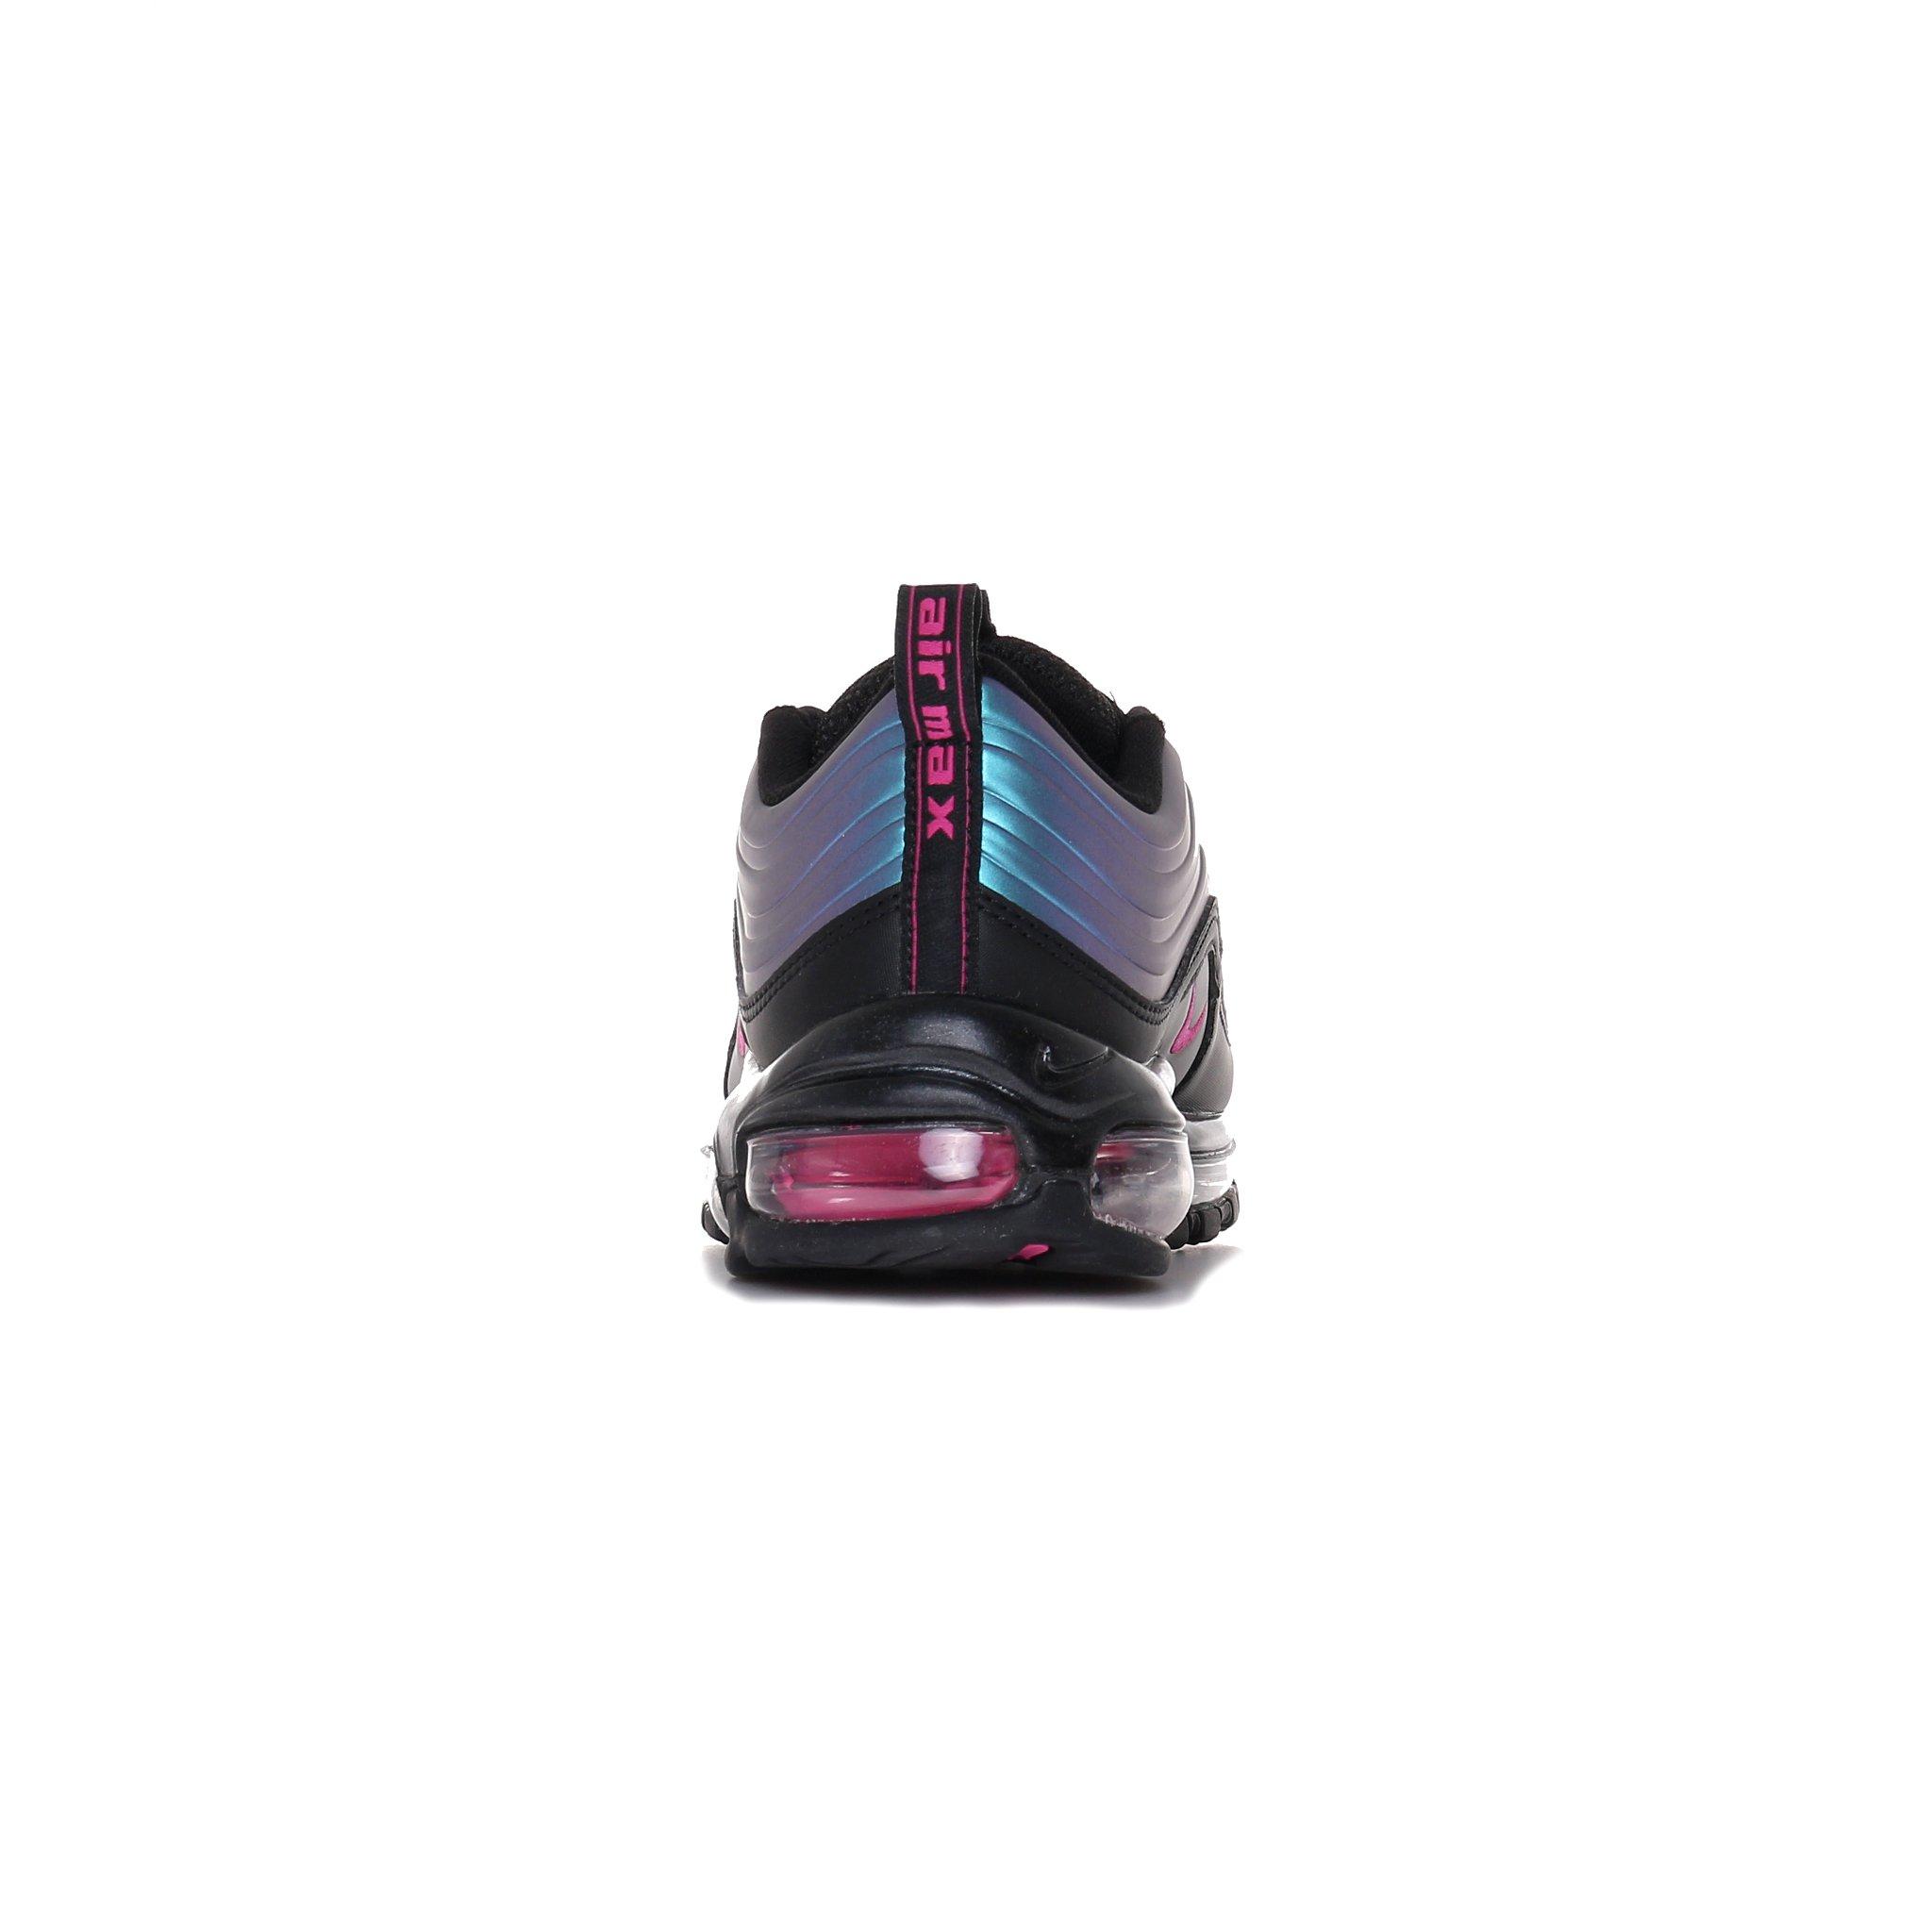 Nike Air Max 97 LX BlackThunder GreyLaser Fuchsia